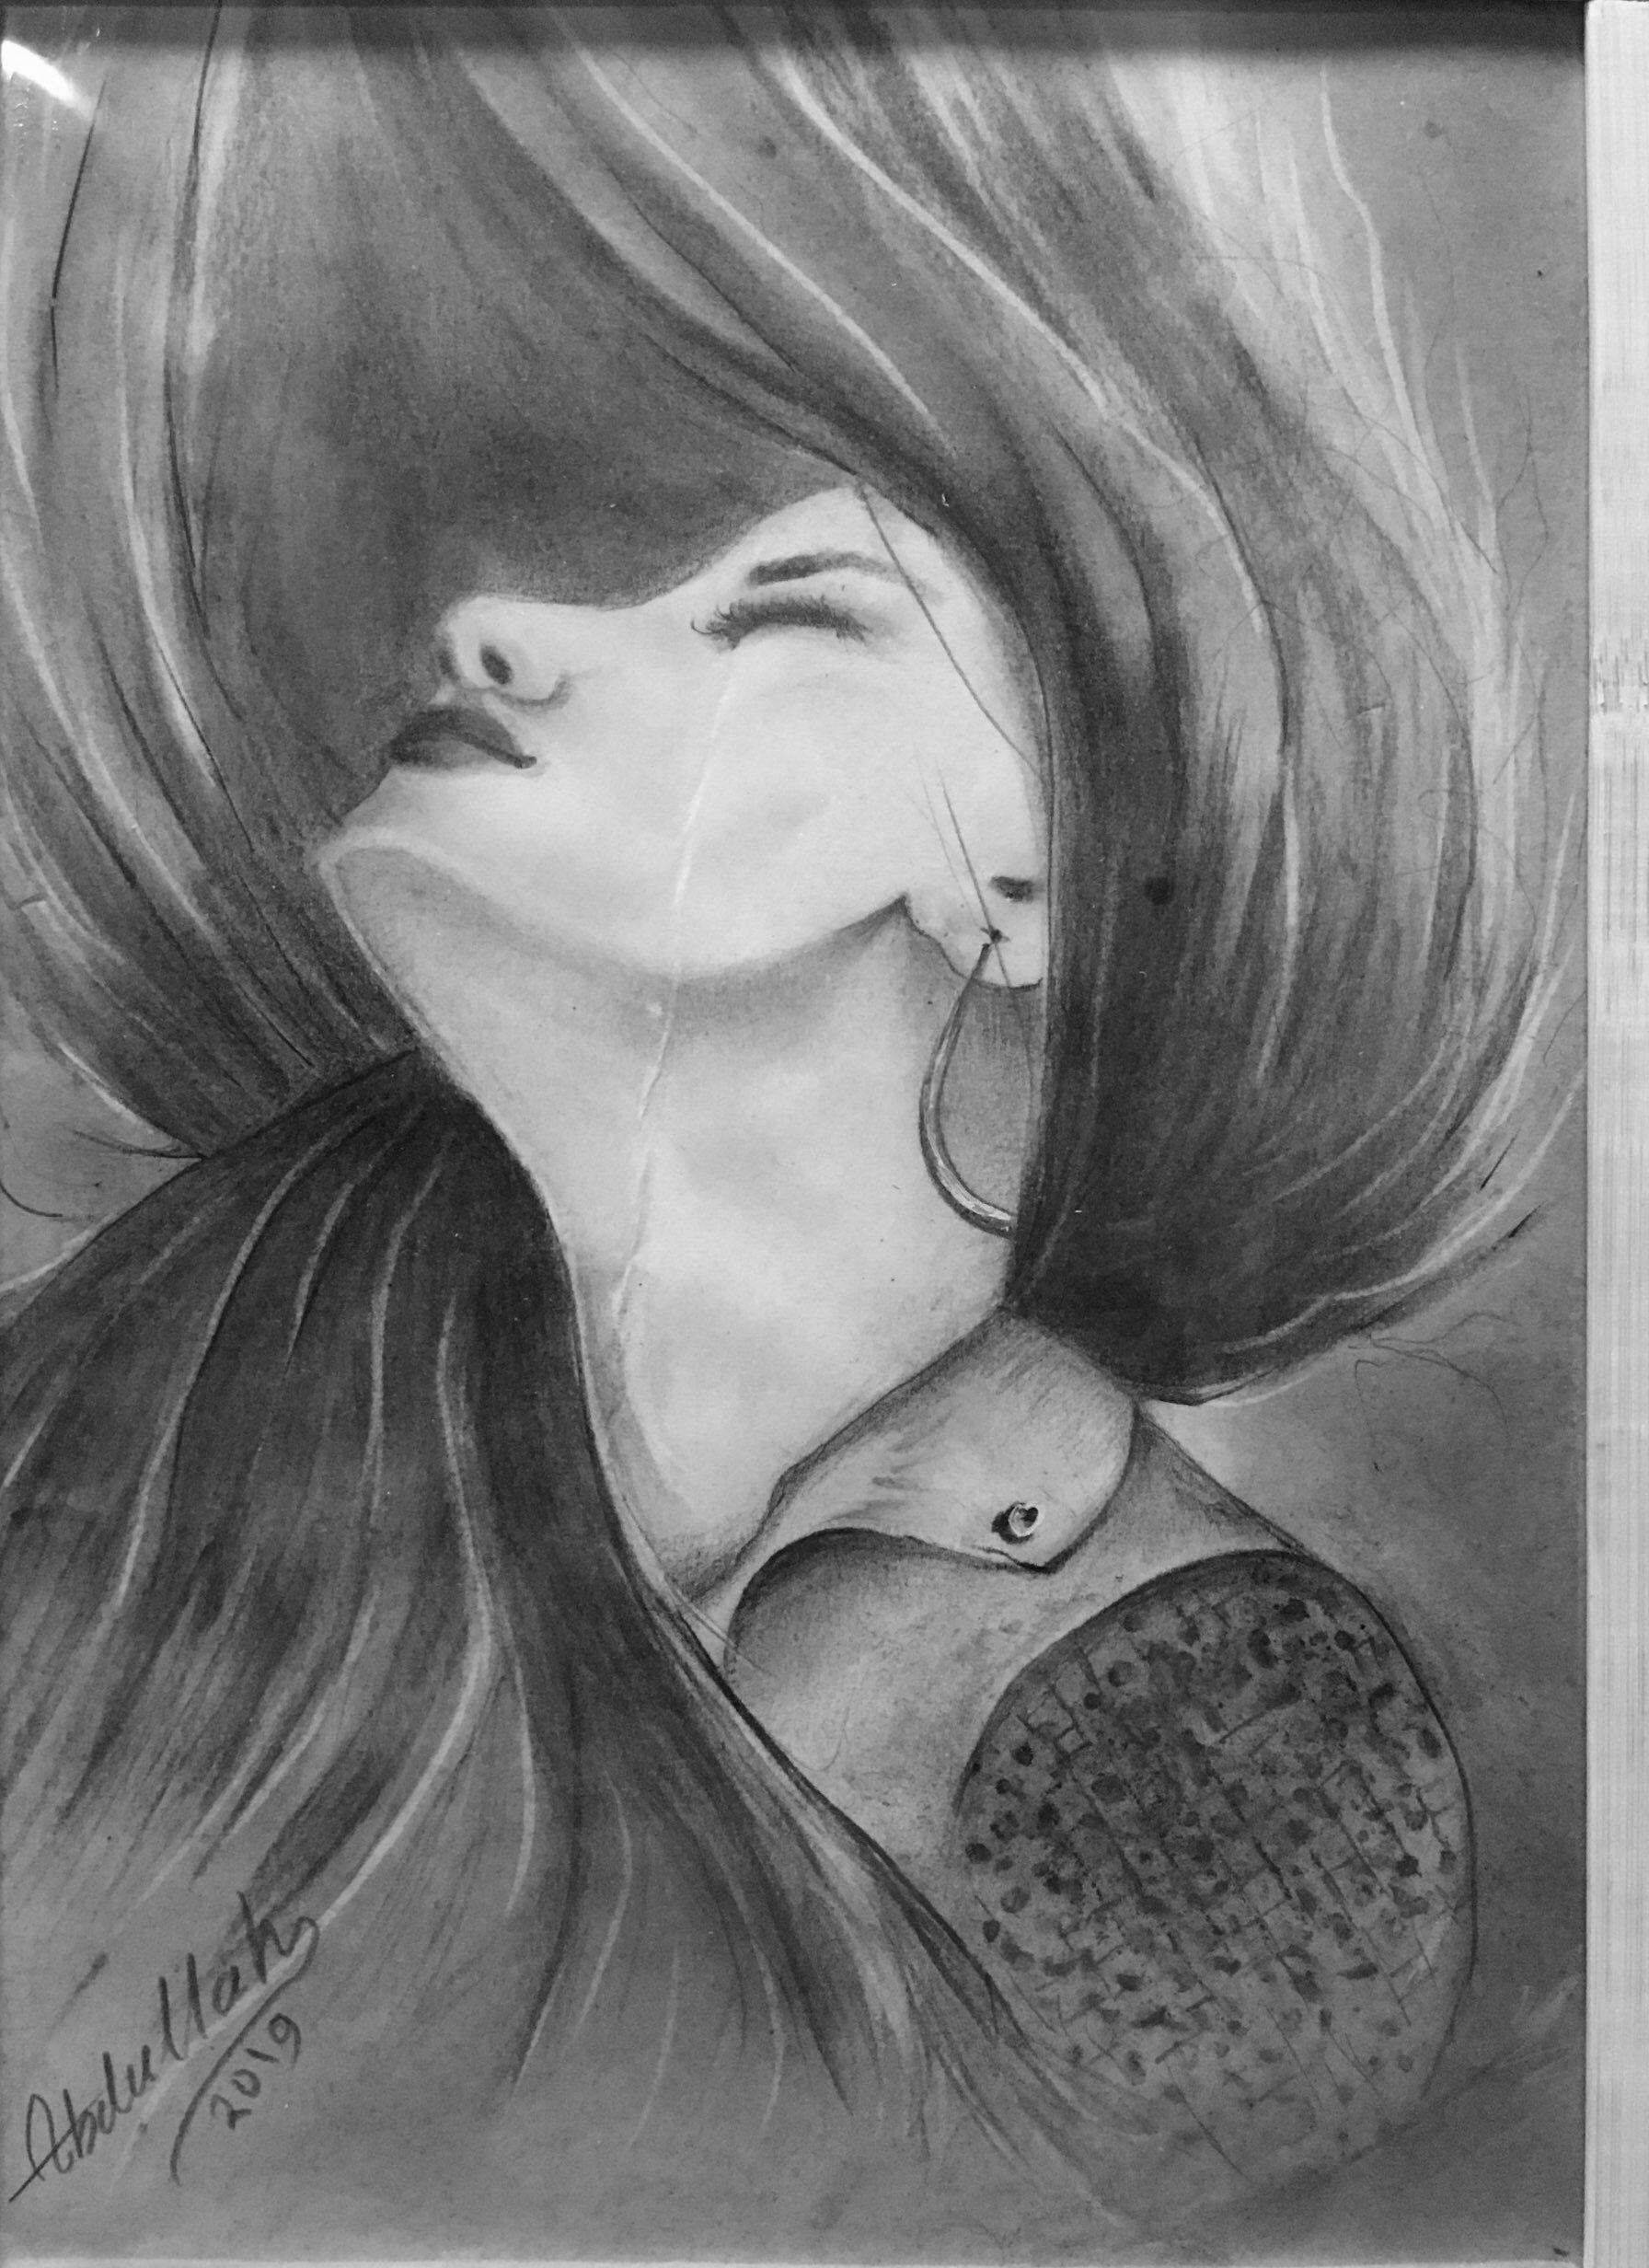 رسم بالفحم والرصاص Interesting Faces Art Drawings Female Sketch